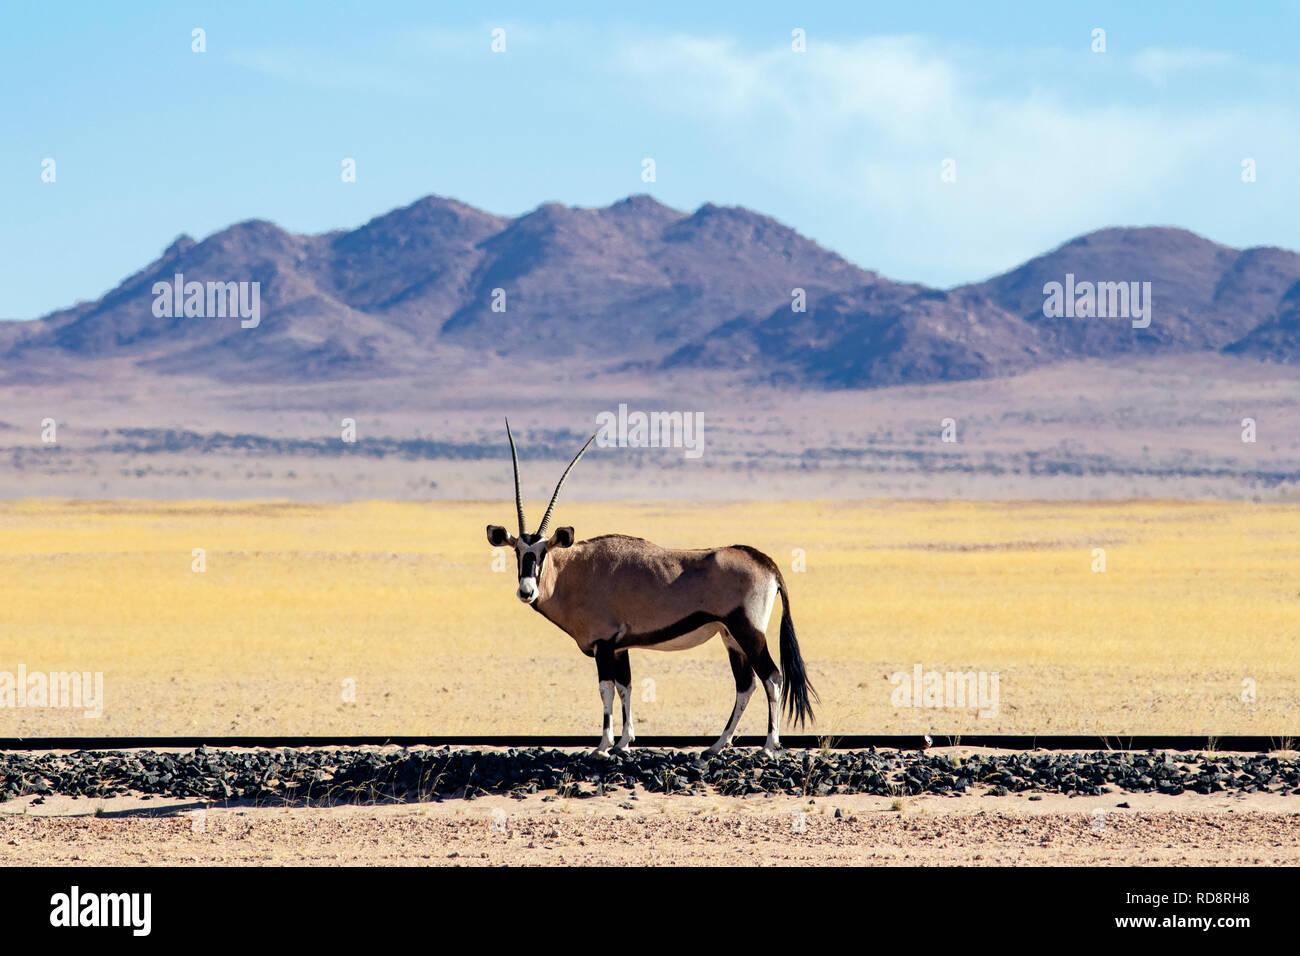 Gemsbok or Oryx (Oryx gazella) on railway near Aus, Namibia, Africa - Stock Image